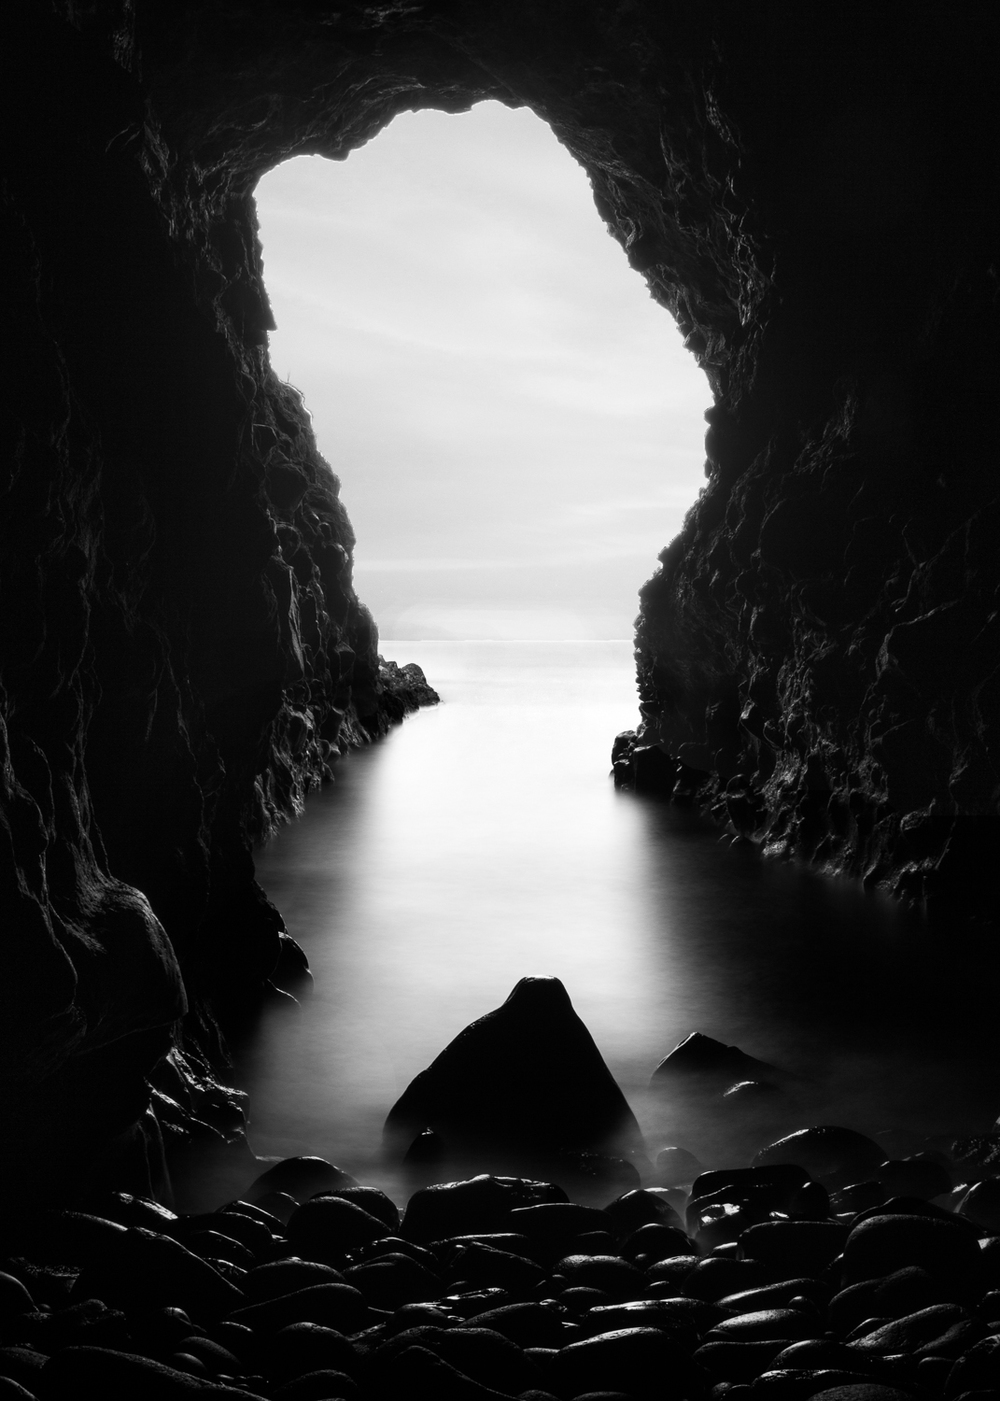 Mermaids Cave, Dunluce